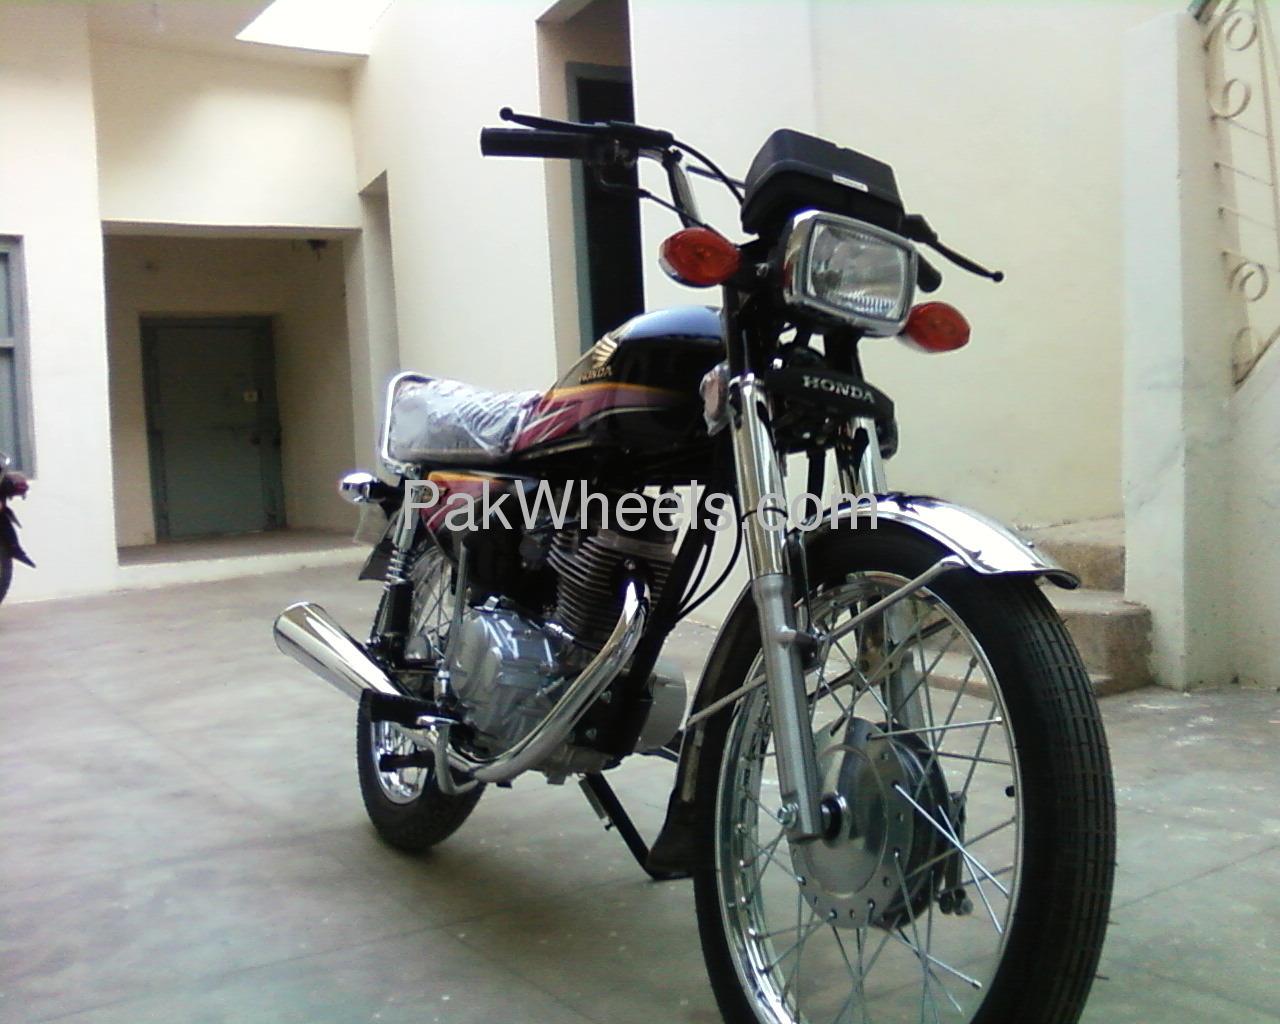 Honda CG 125 2011 Of Rahim609 - Member Ride 17308